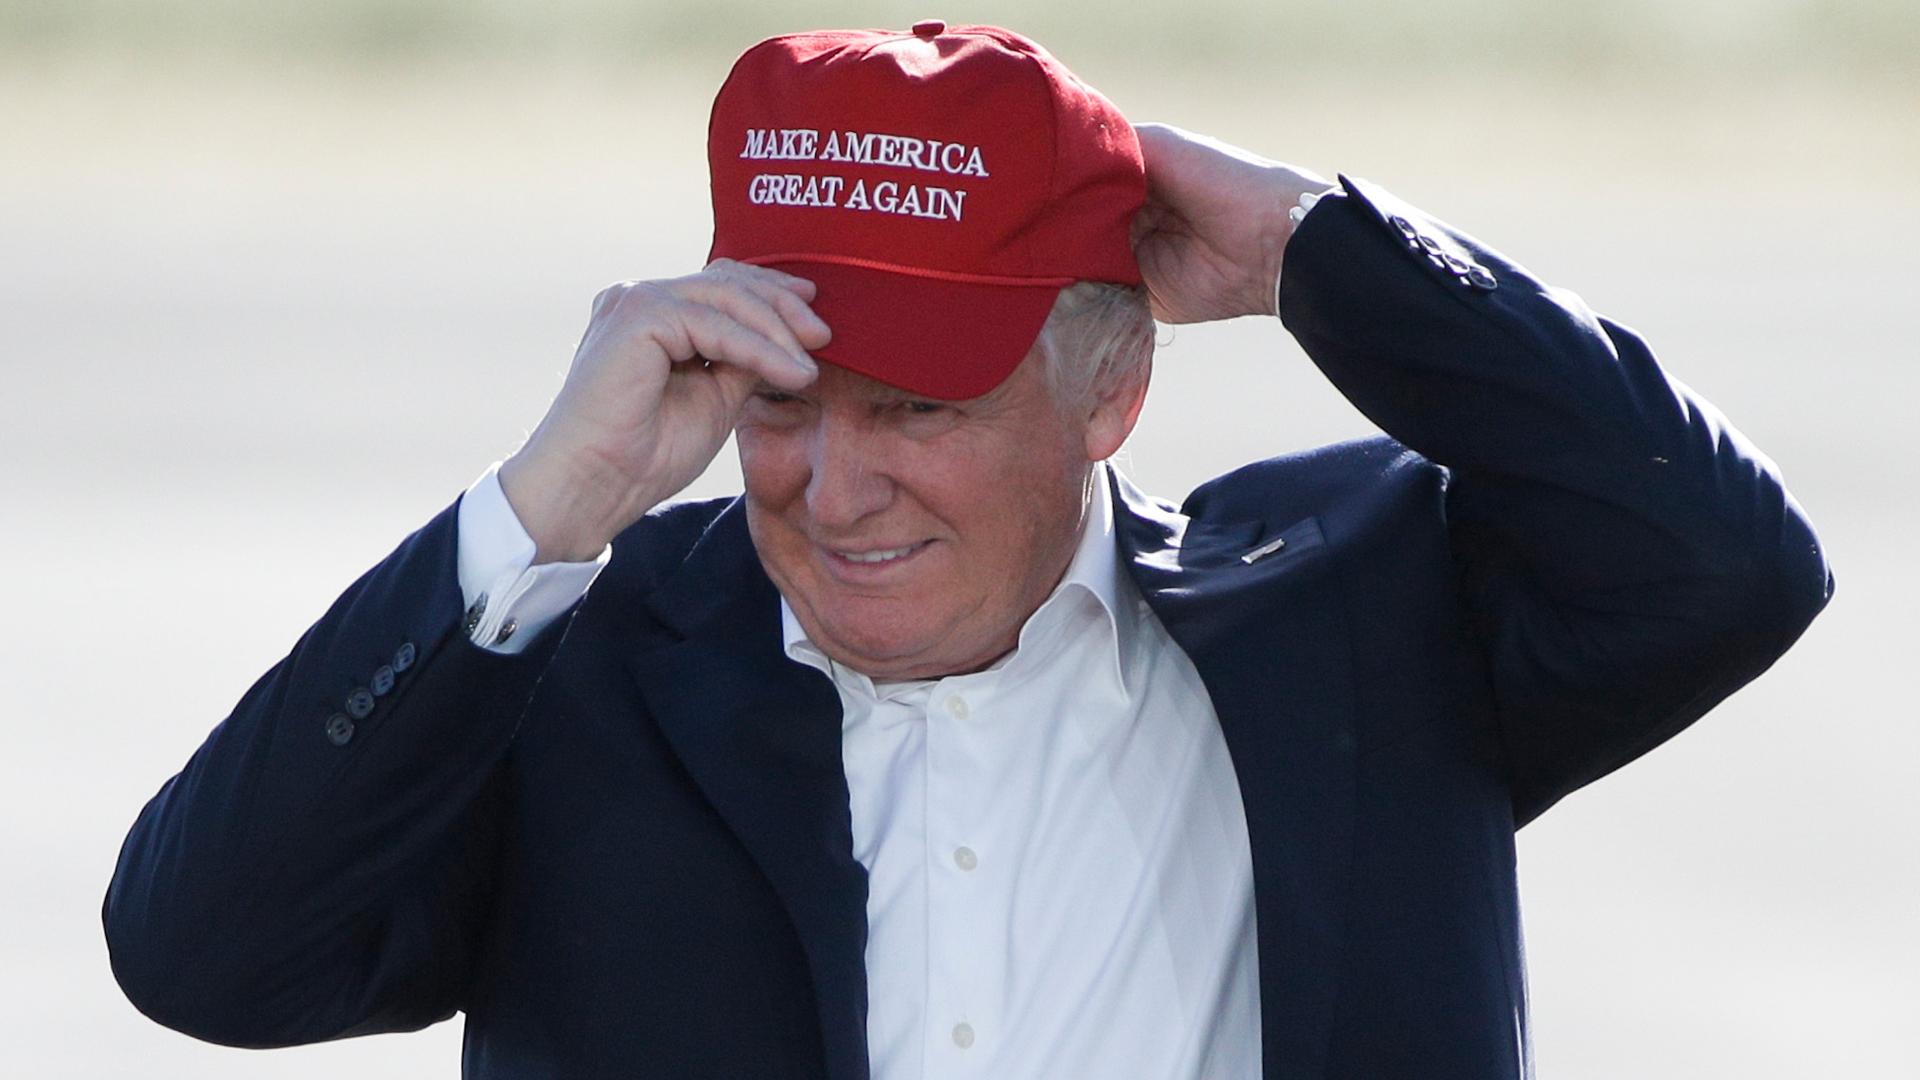 White /& Grey Donald Trump  2020 MAKE AMERICA GREAT AGAIN Election MAGA Cap USA